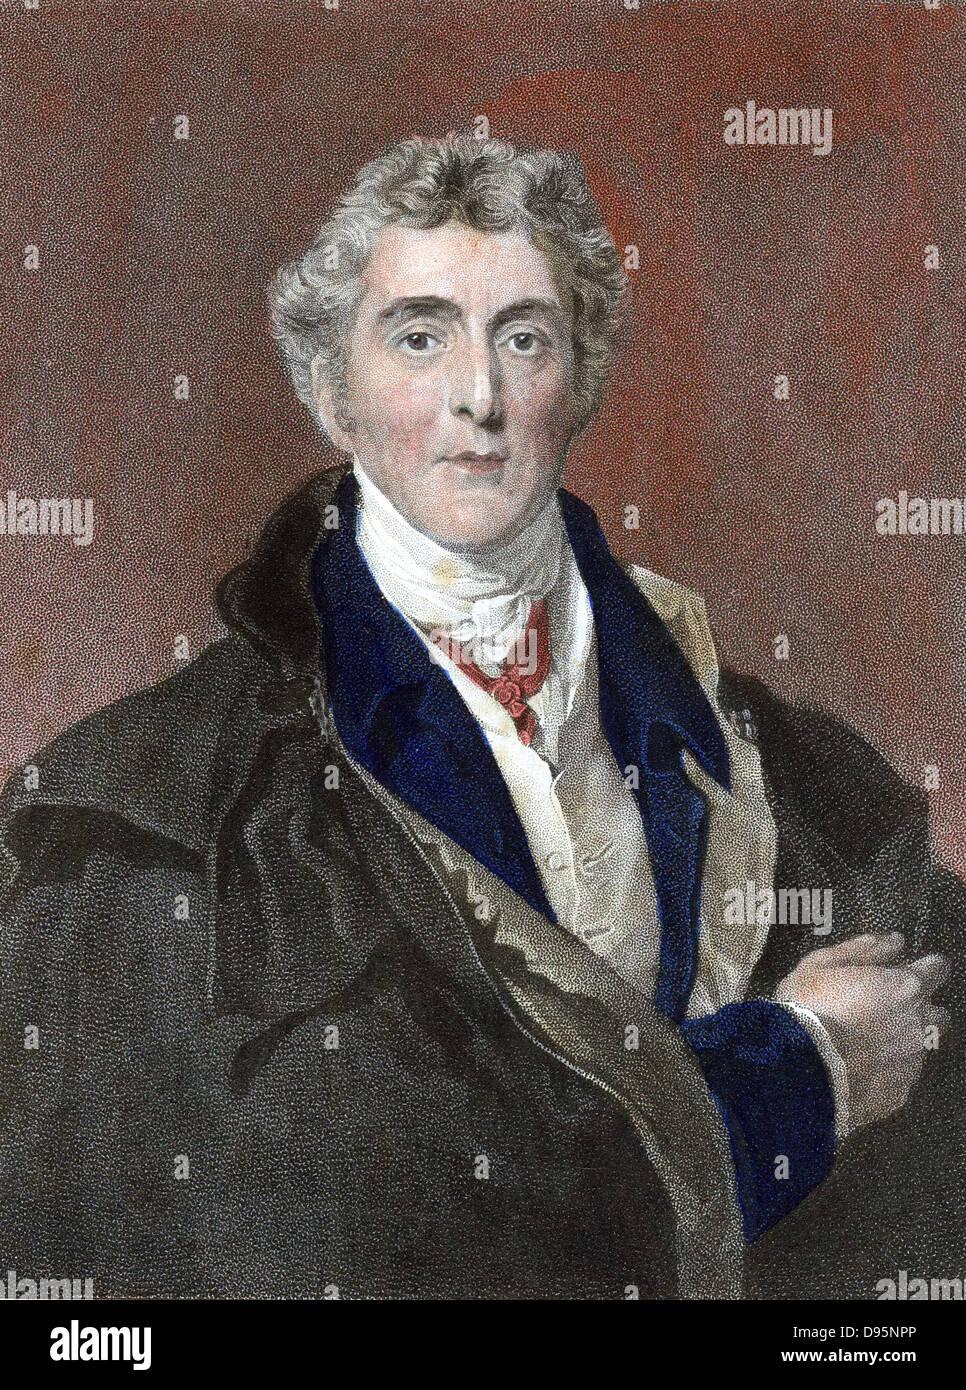 Arthur Wellesley 1st Duke of Wellington (1769-1852) British soldier and statesman. Defeated Napoleon at Waterloo. - Stock Image